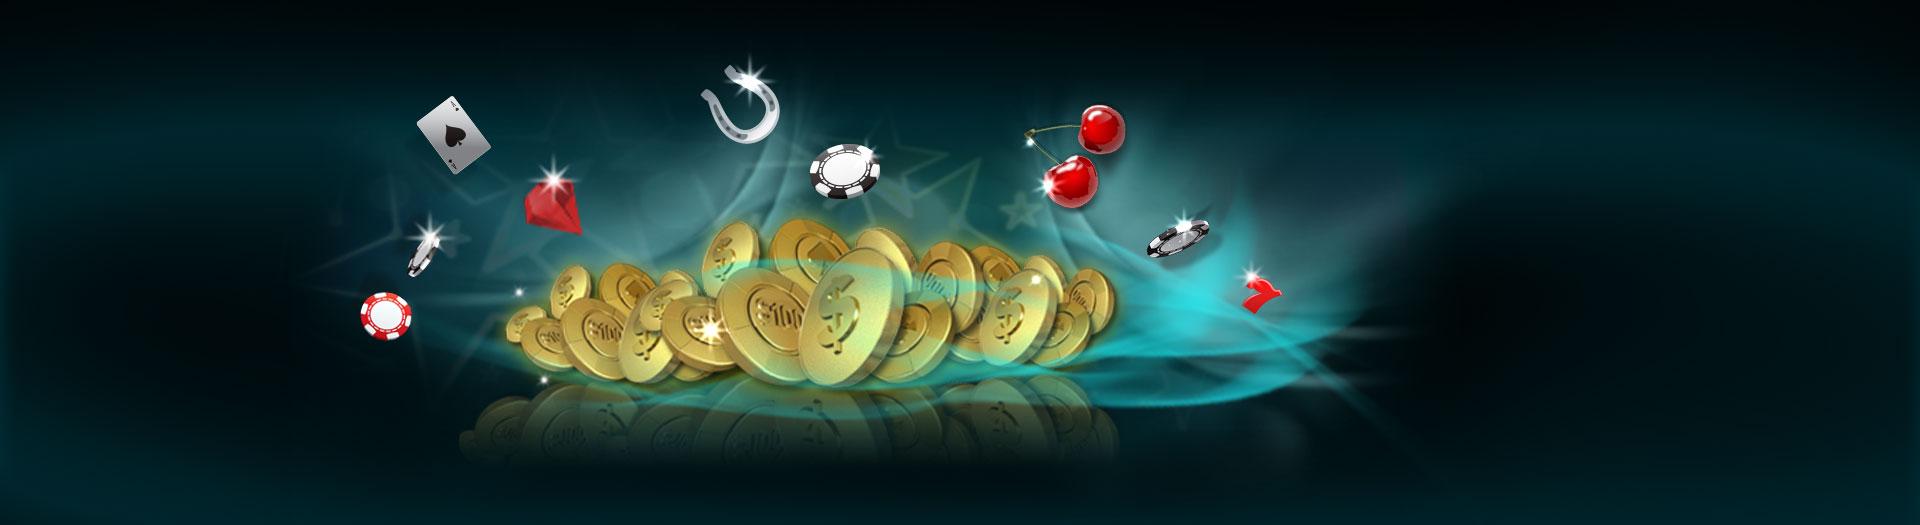 how to win online casino video